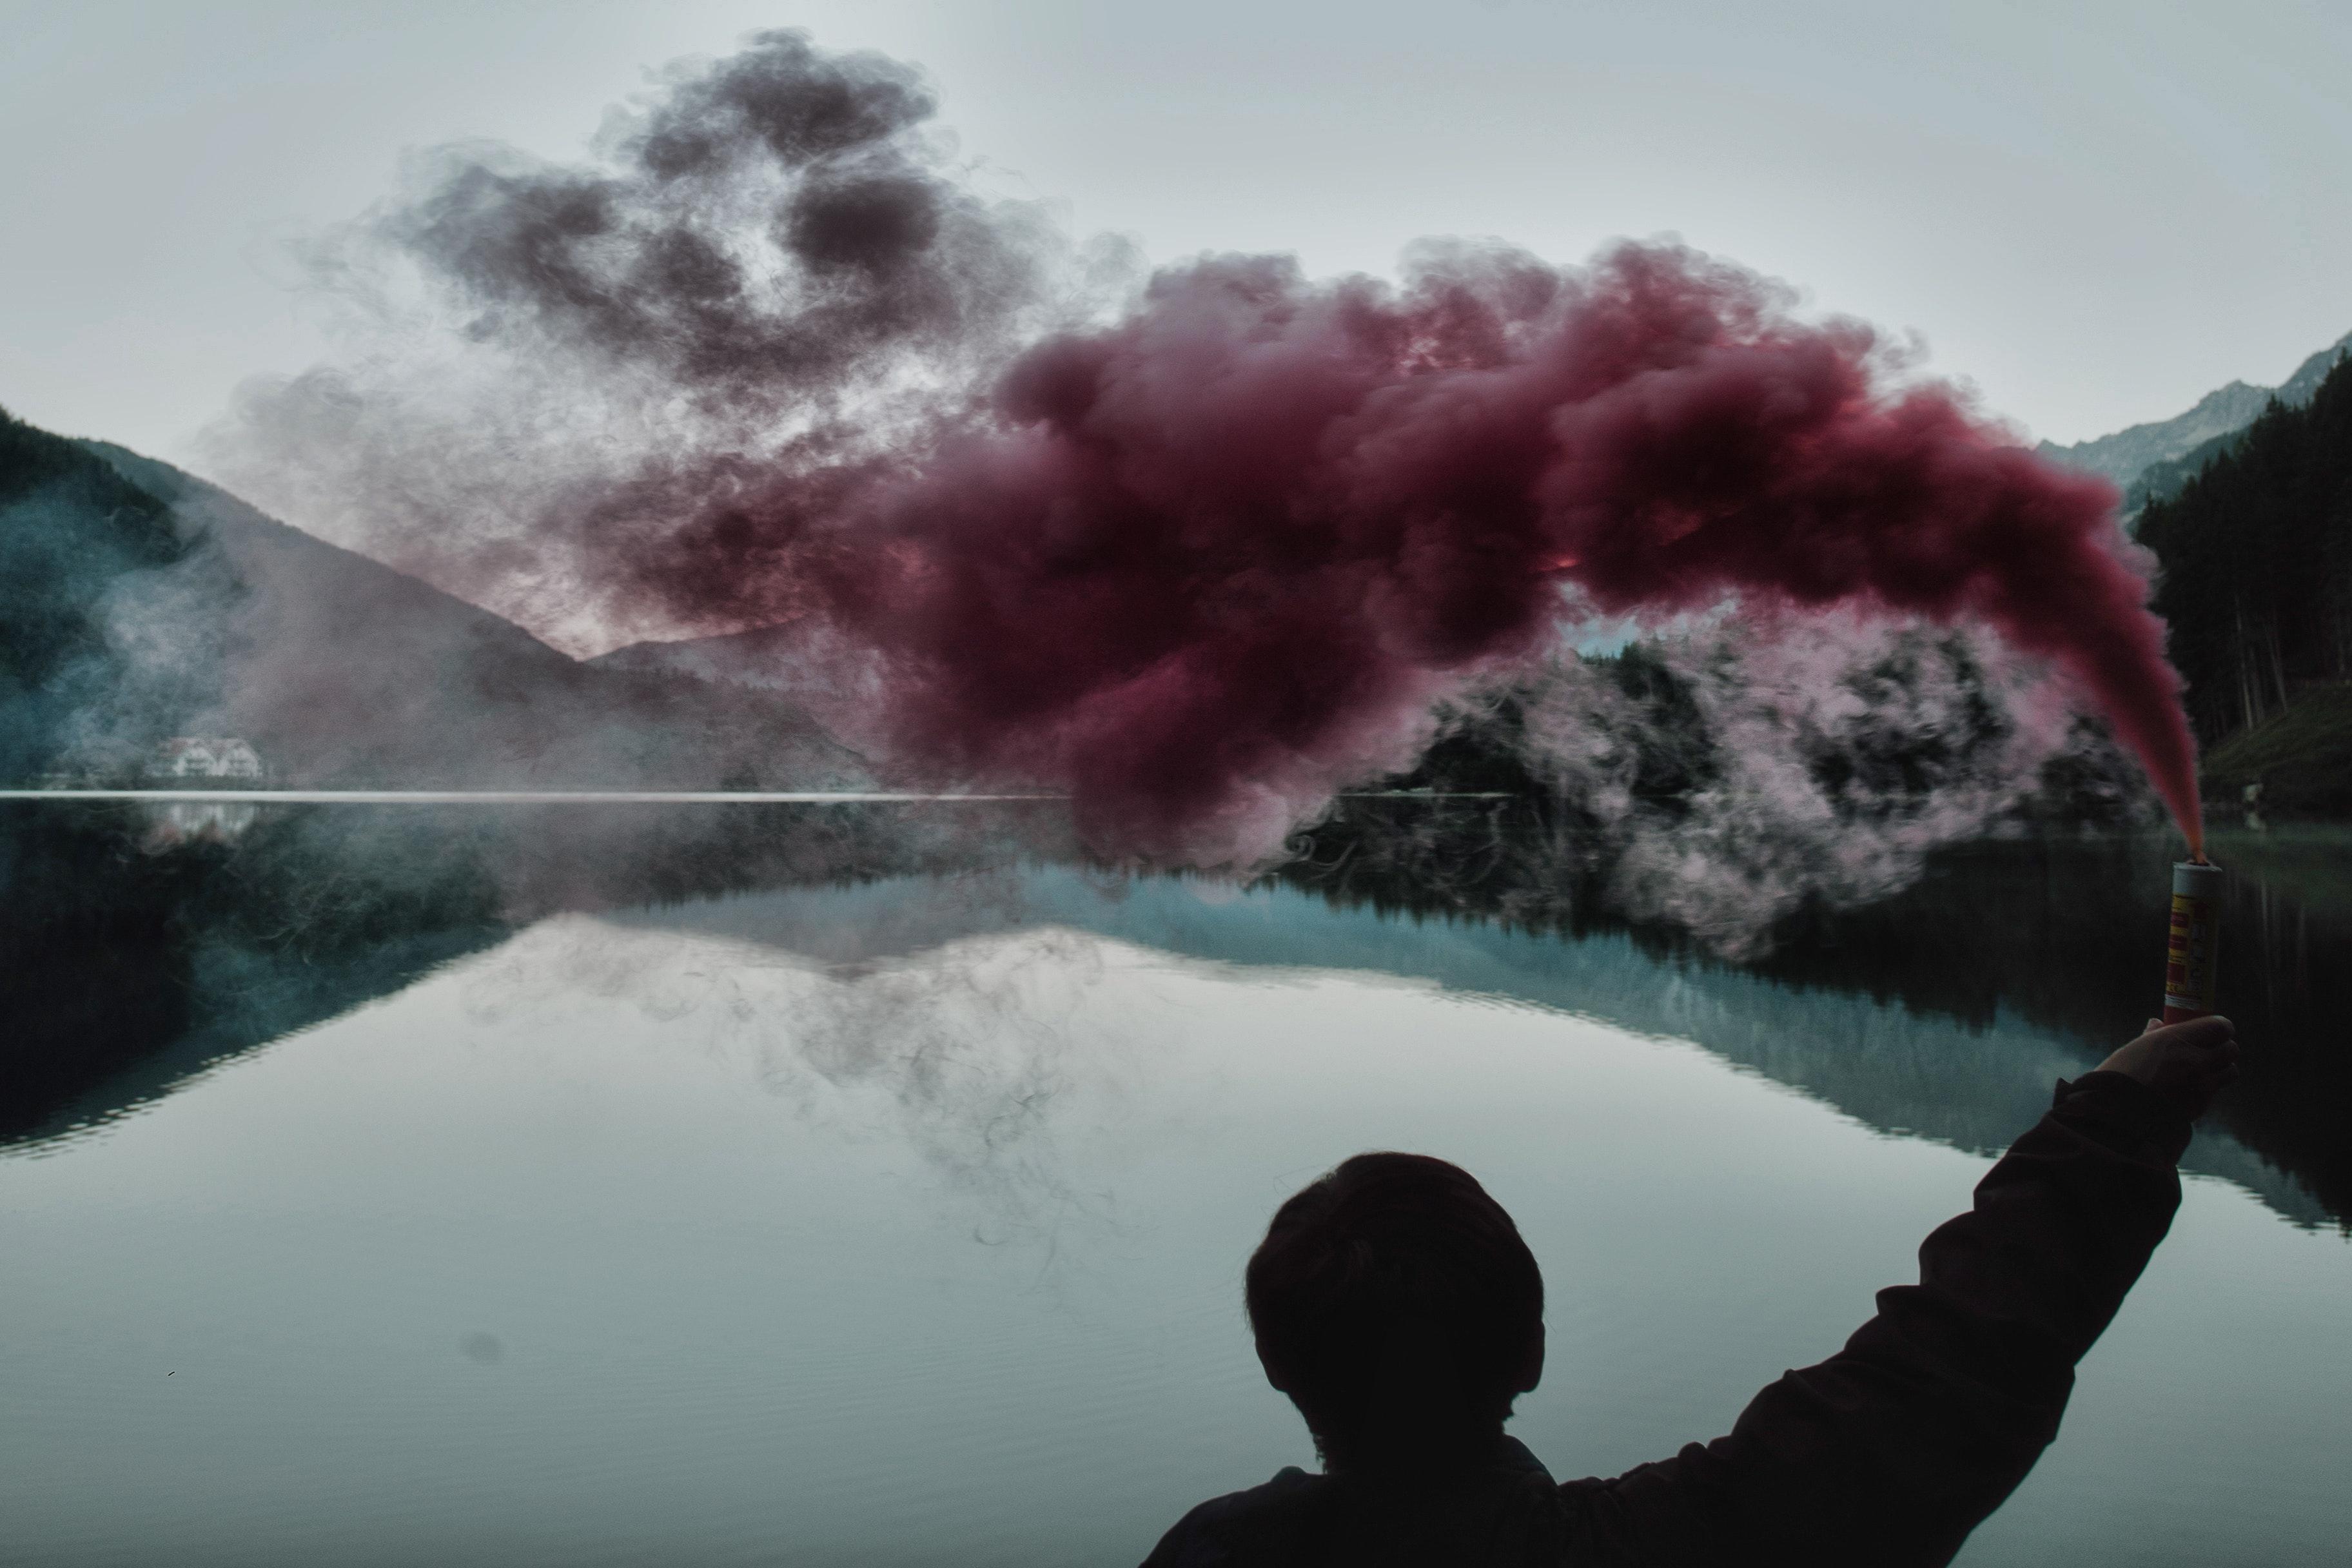 Daylight Desktop Backgrounds Lake Lakeside Landscape Mountain Reflection Silhouette Smoke